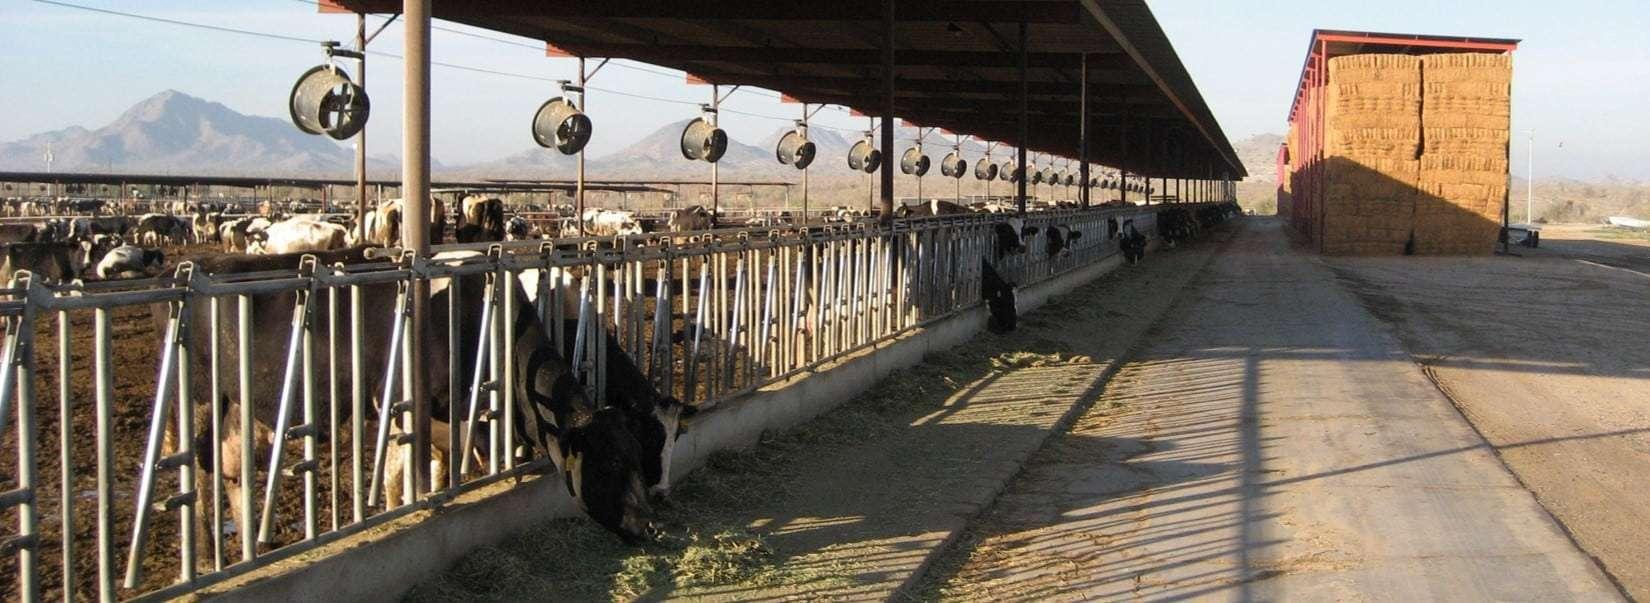 89 Ac. Dairy and Land, Buckeye, AZ